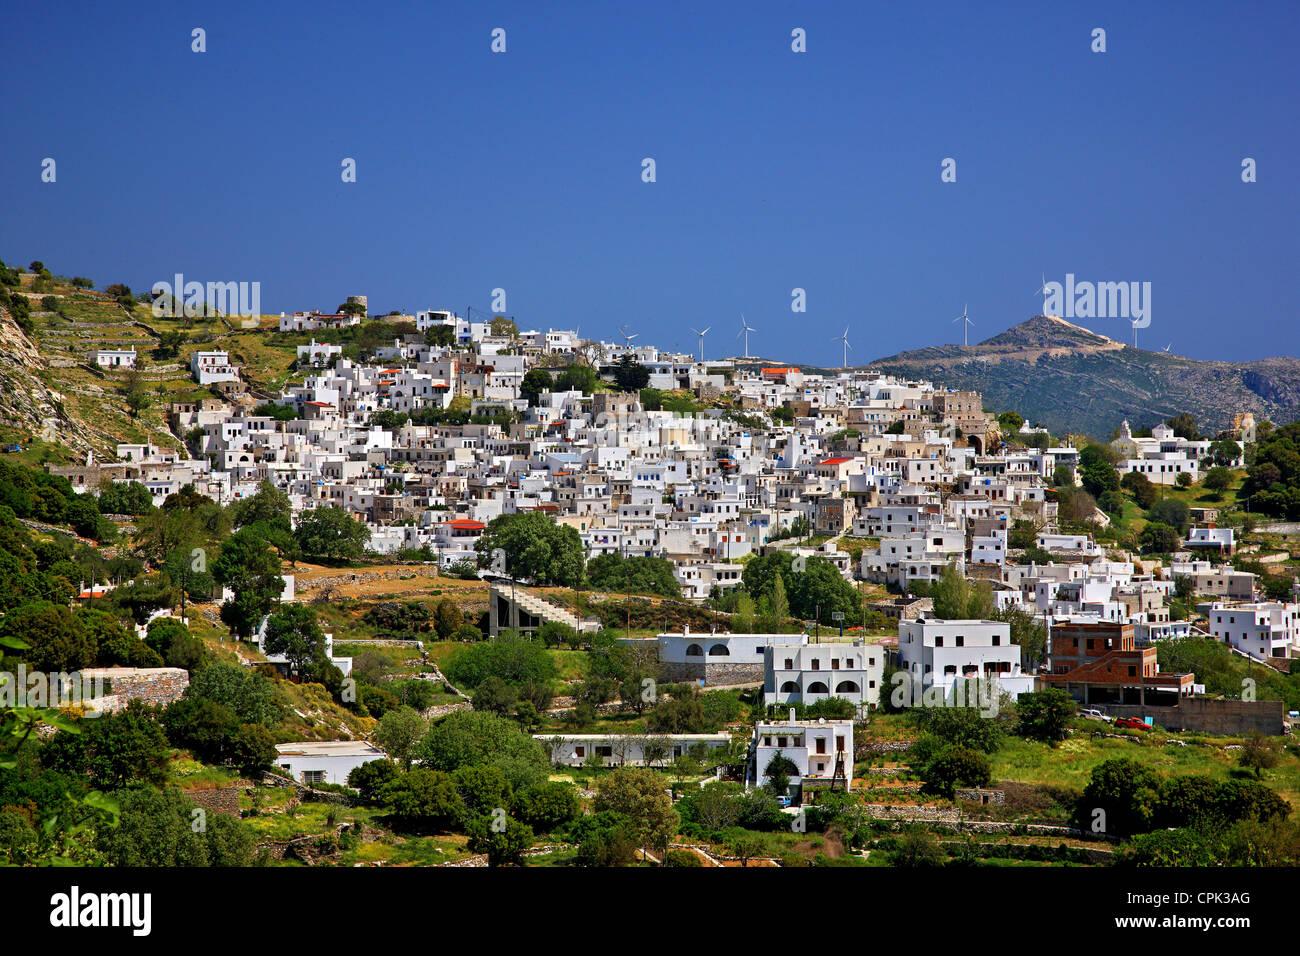 Apiranthos (or 'Apeiranthos')  village, one of the most beautiful mountainous villages of Naxos island, - Stock Image